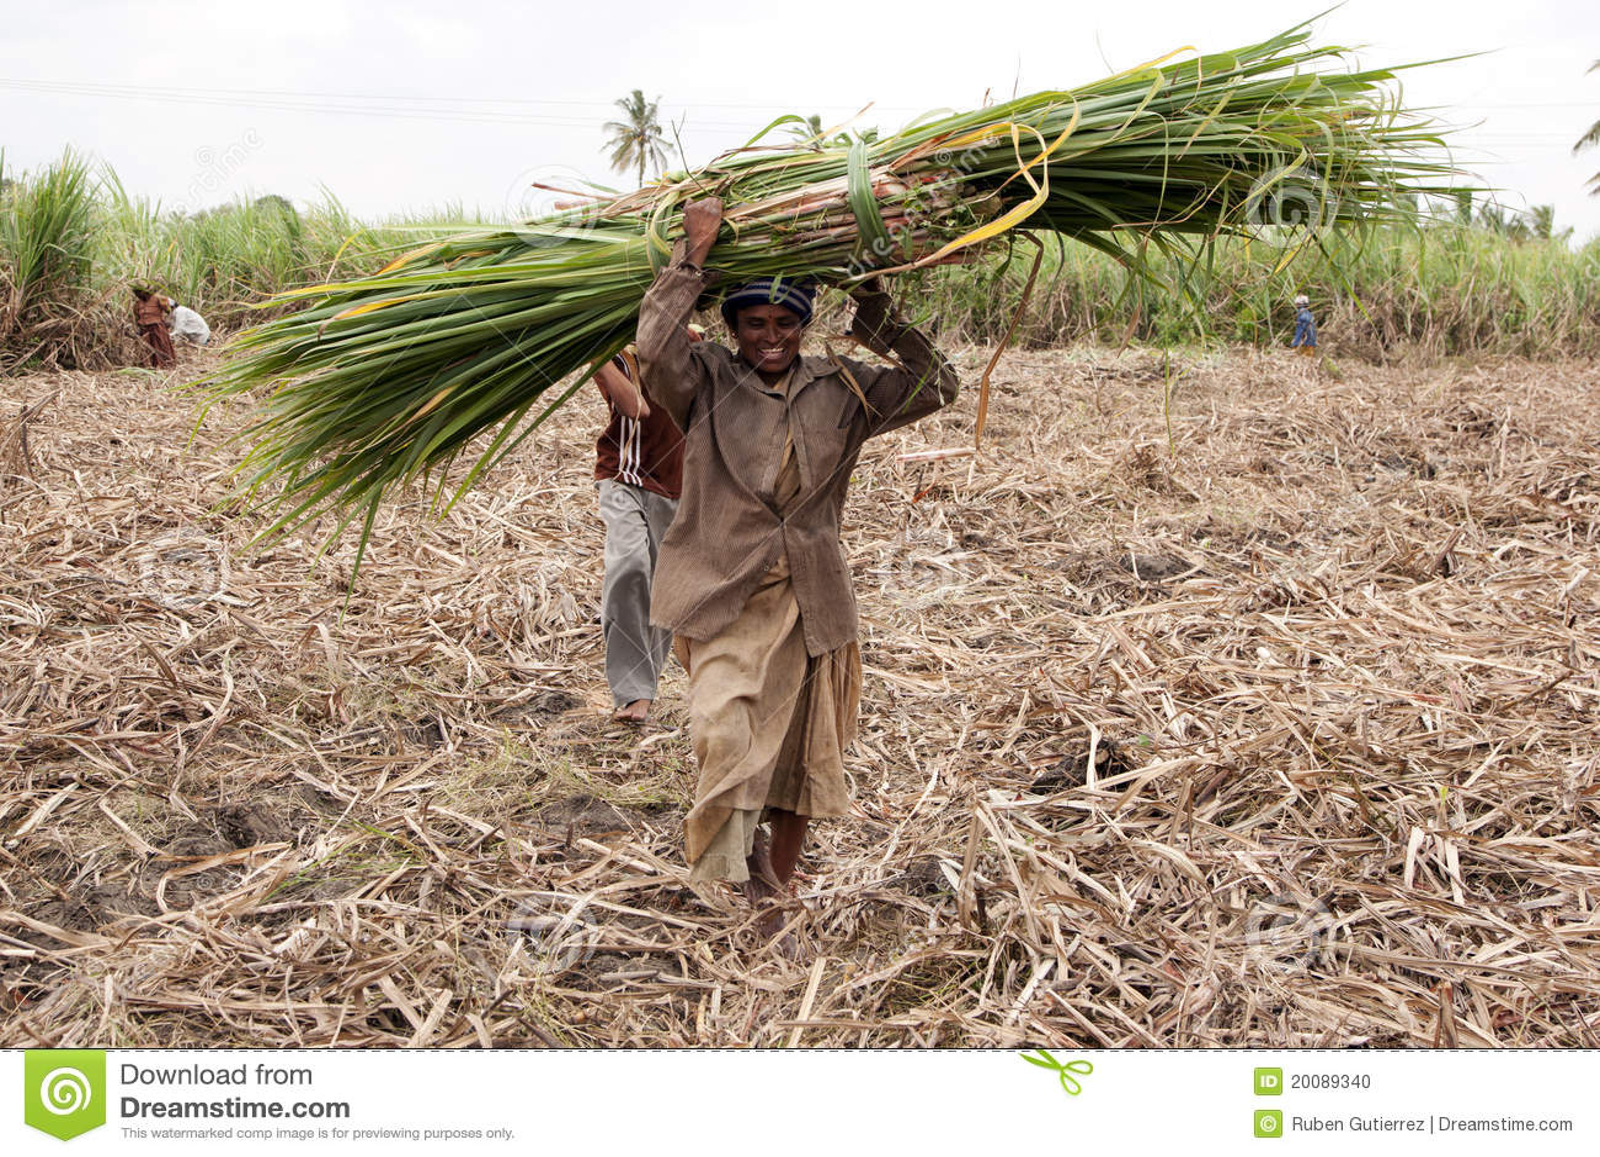 How to Harvest Sugar Cane photo